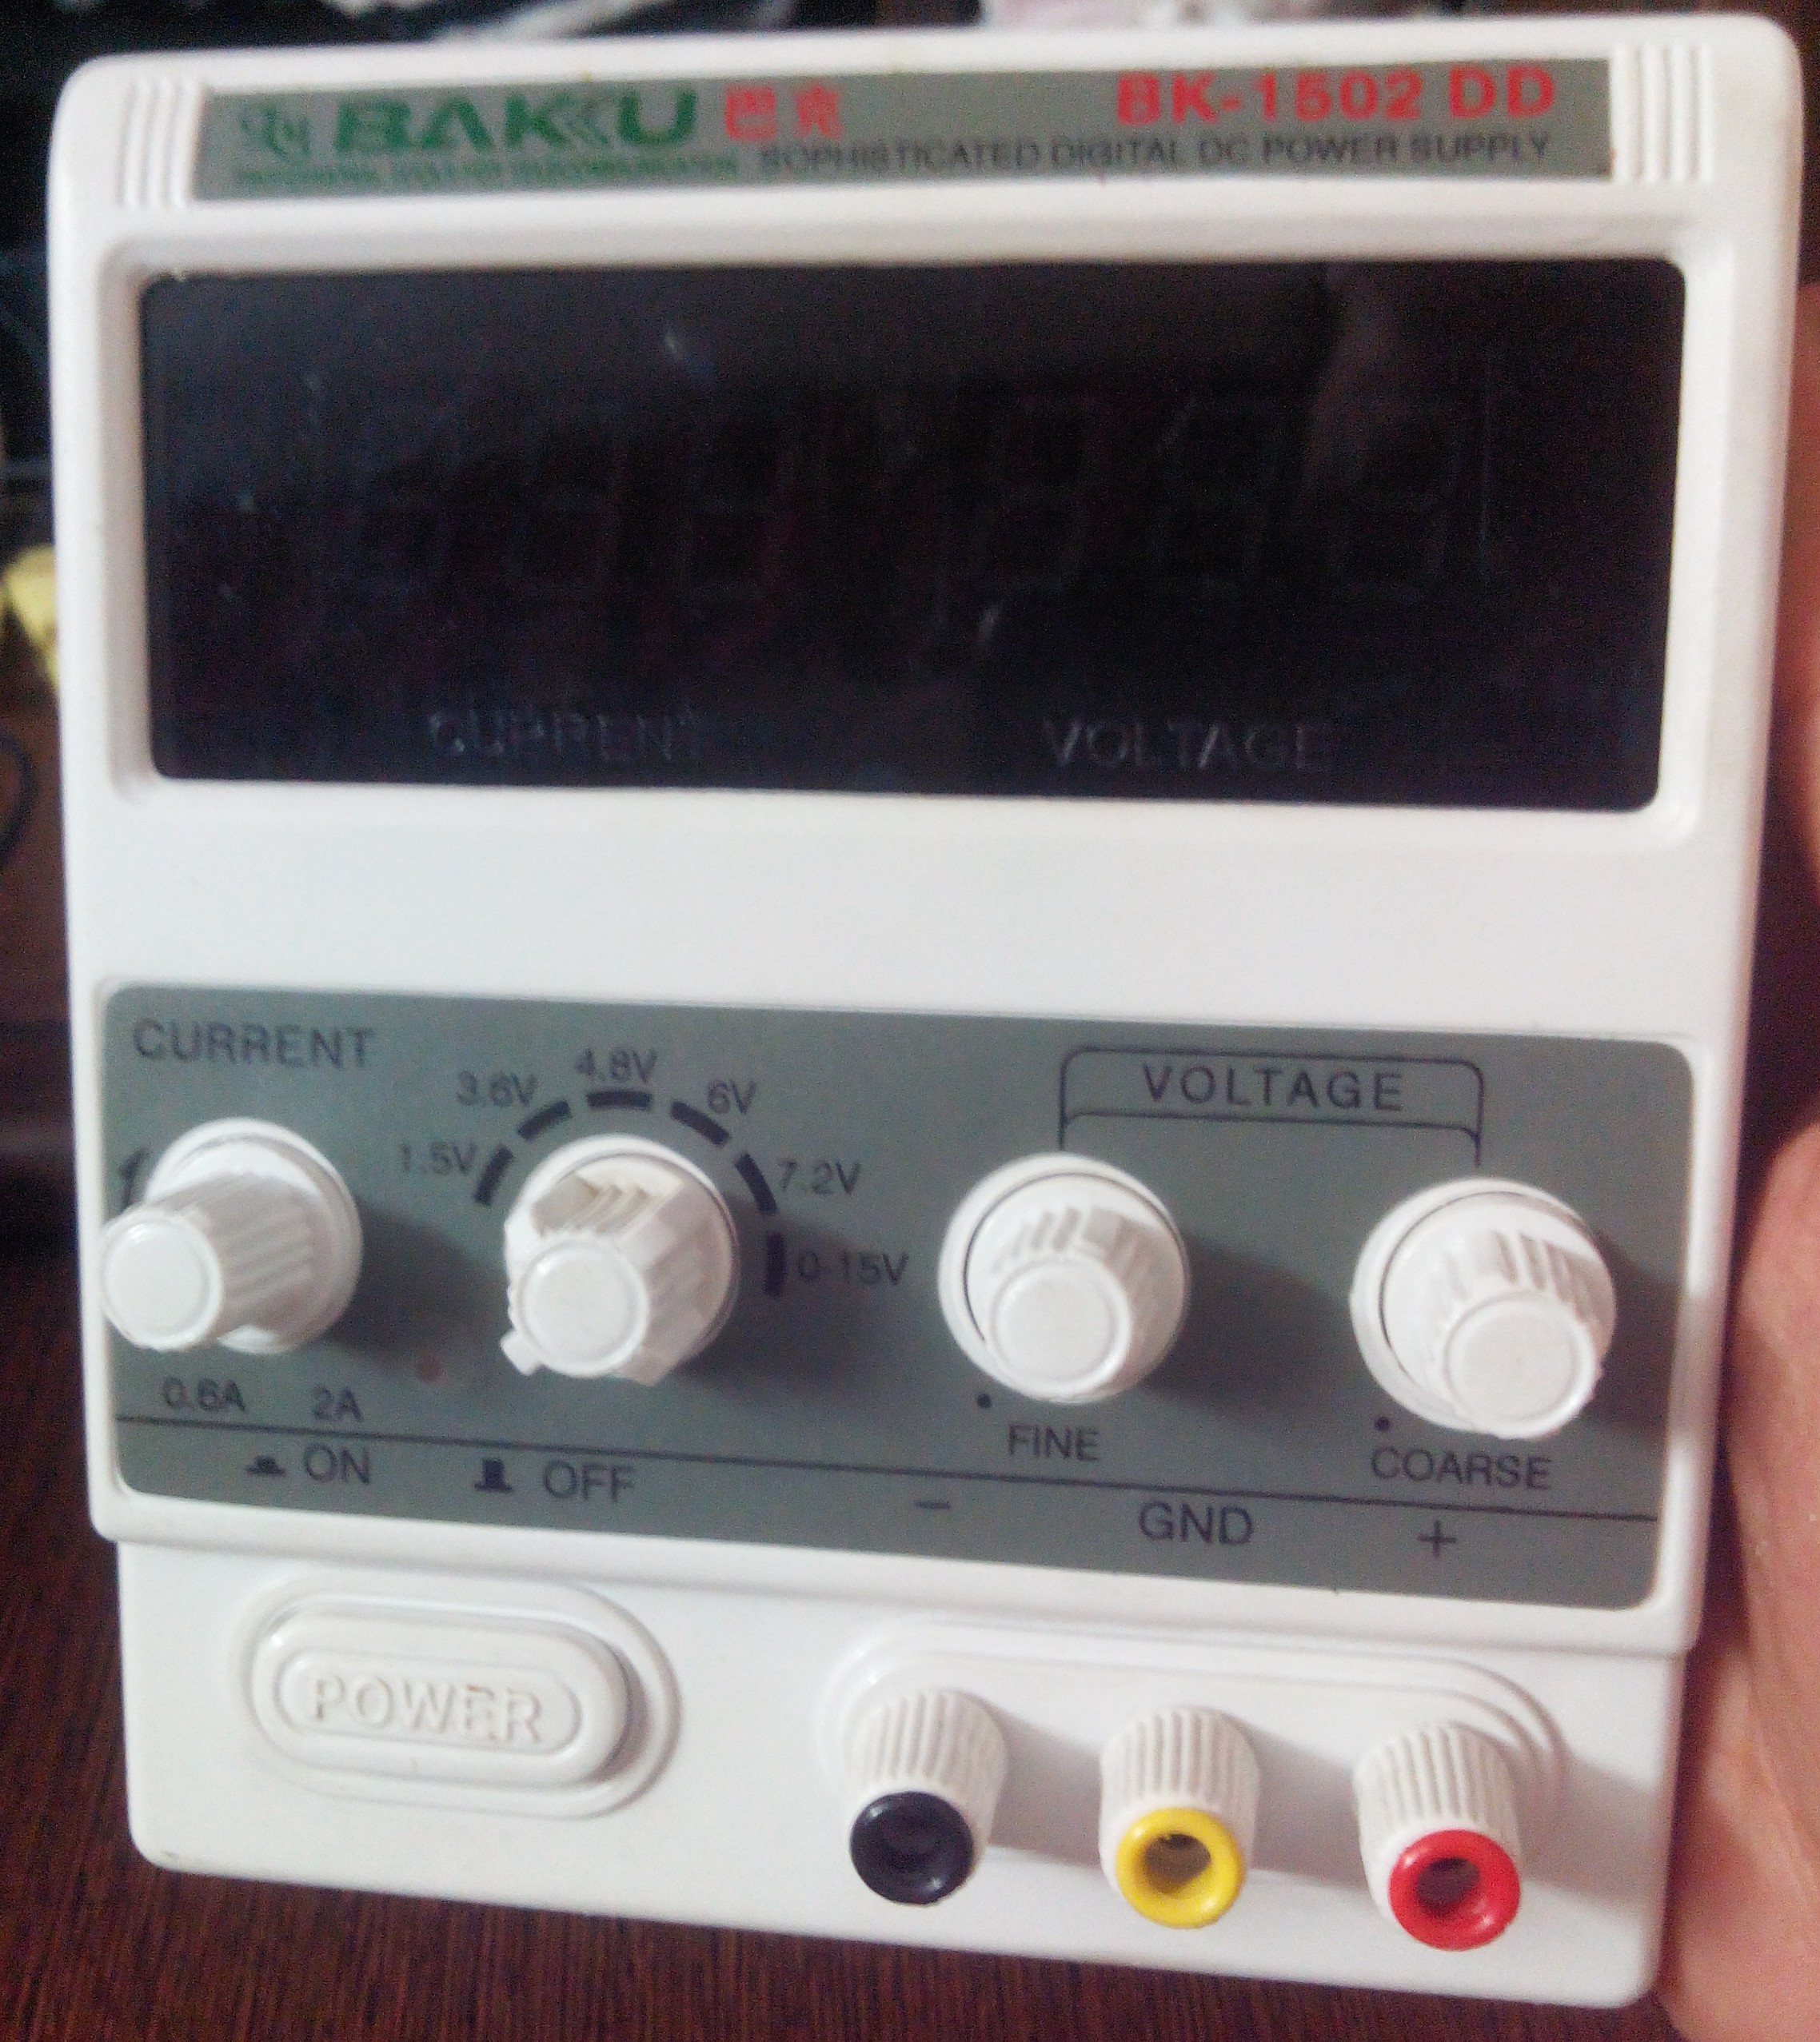 Cheap Power Supply Teardown (13$)